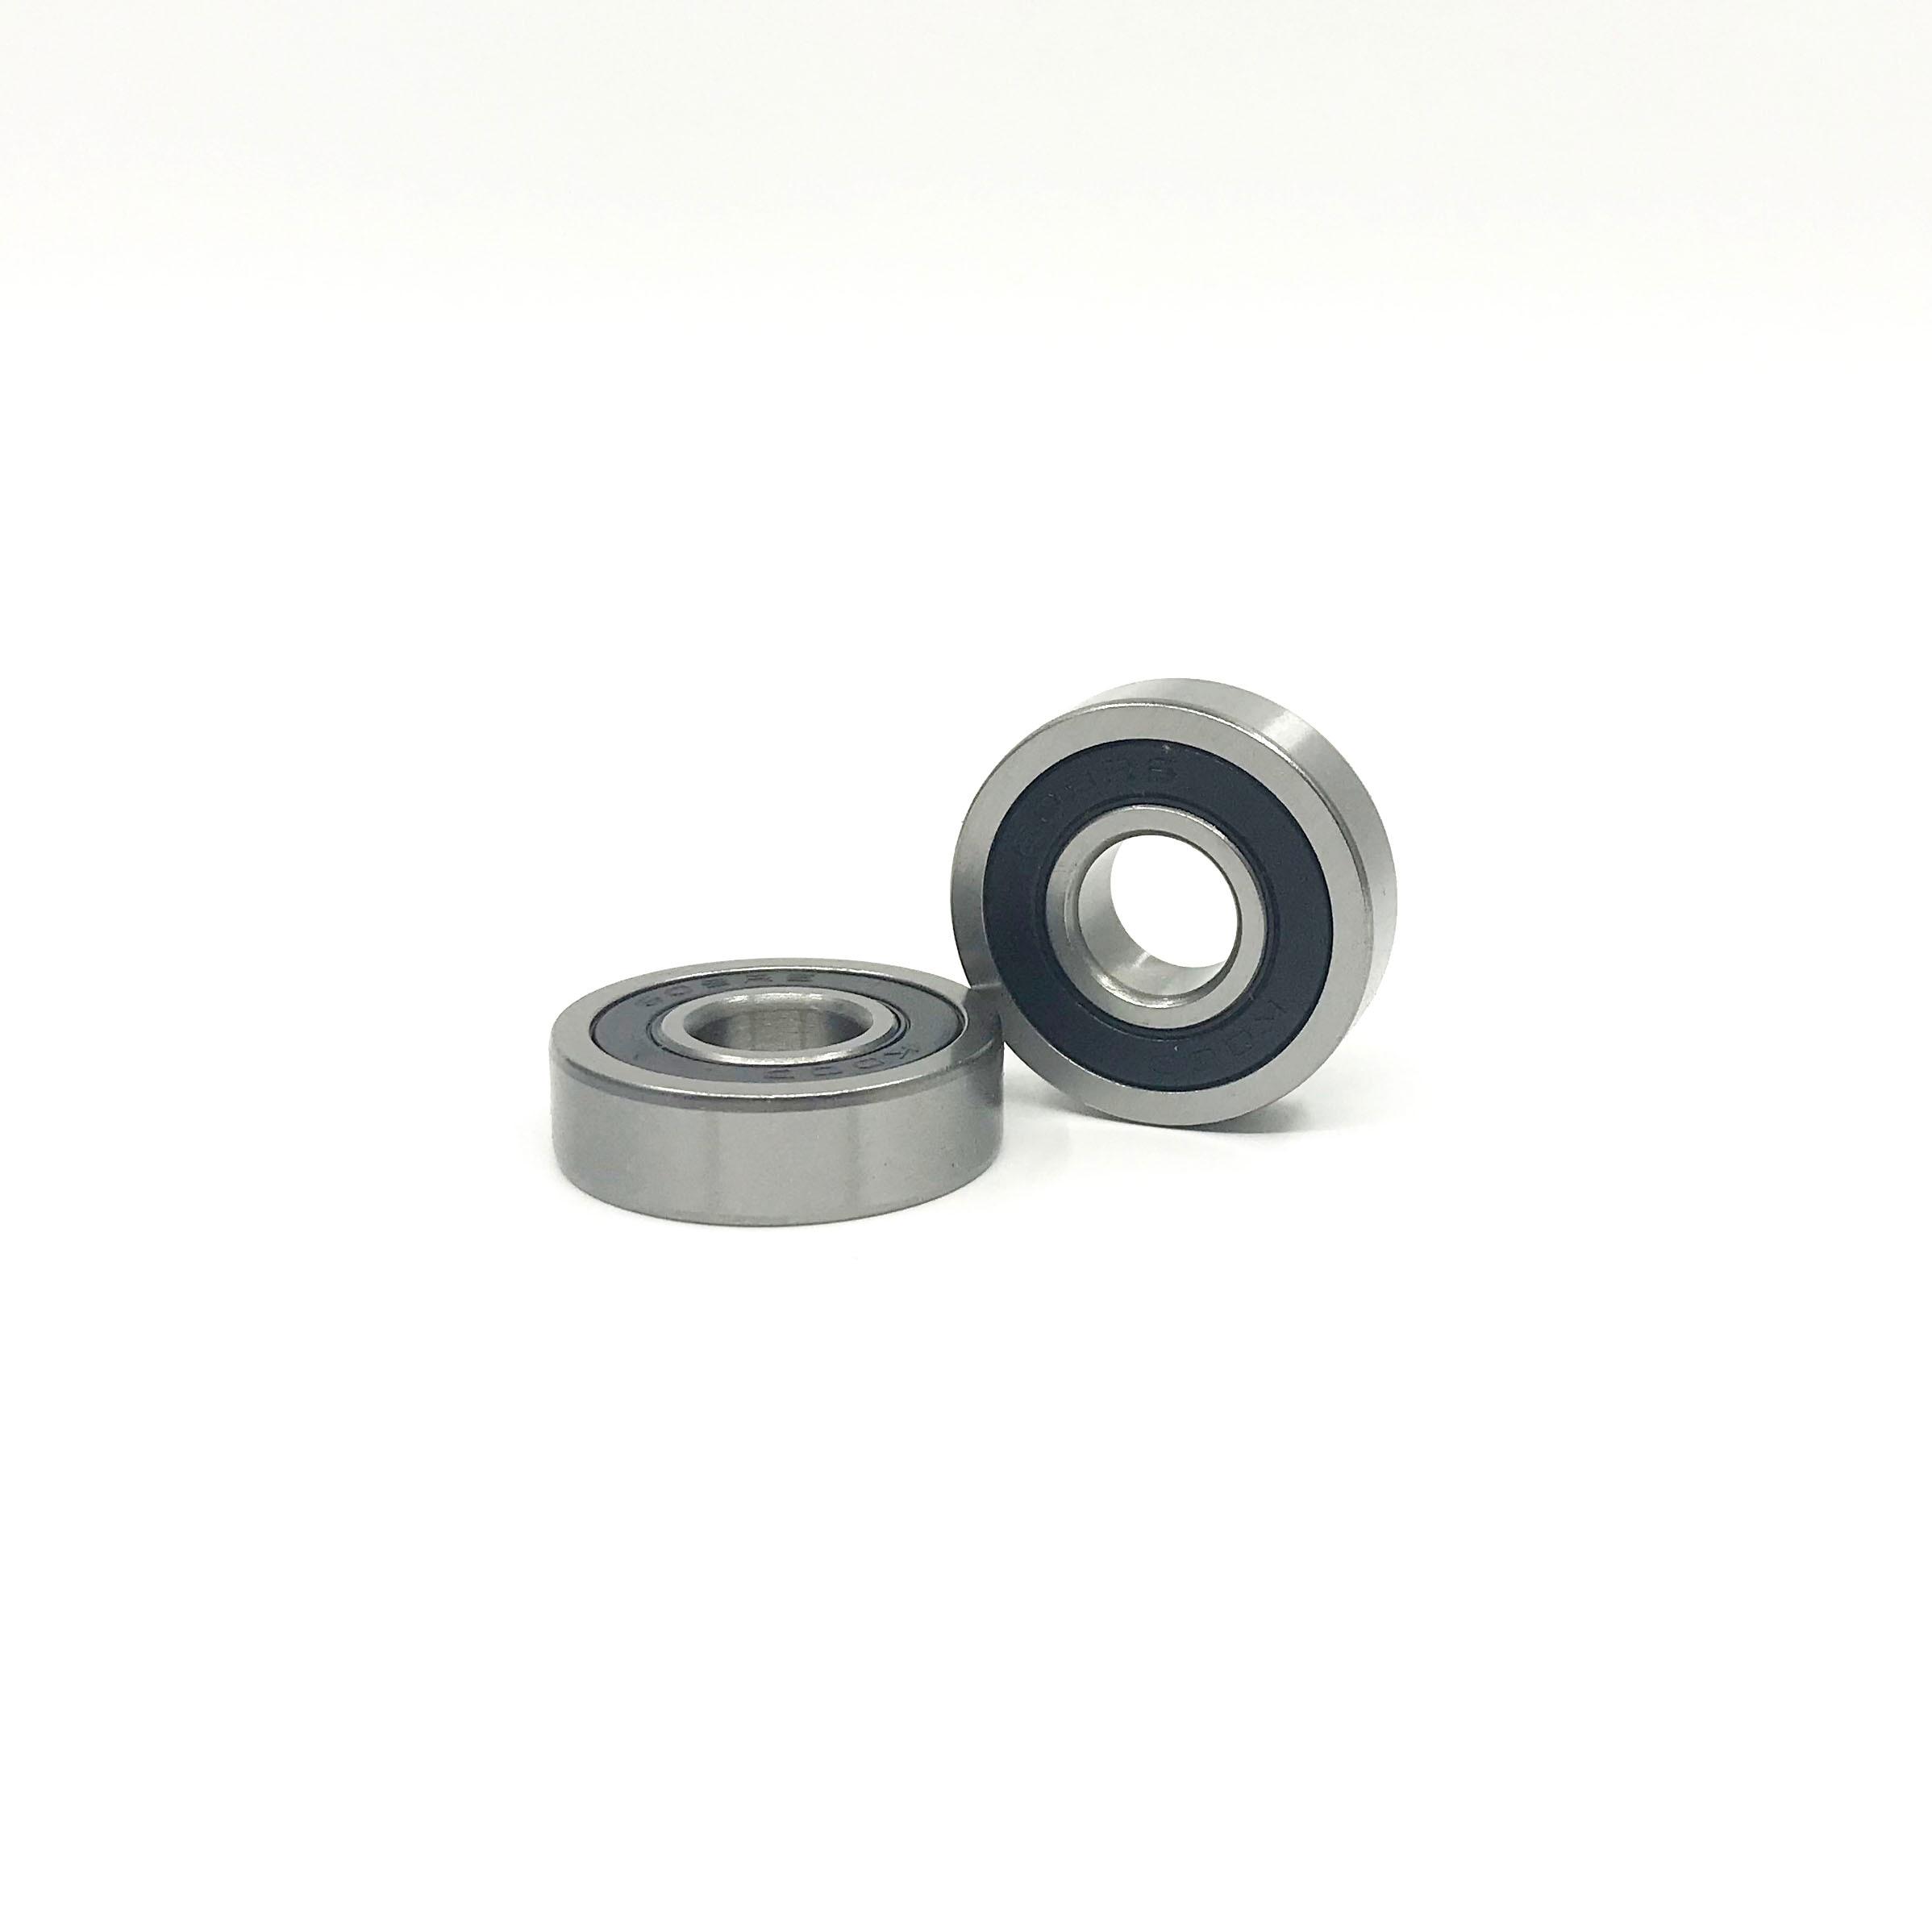 609RS 9x24x7 mm BLACK Rubber Sealed Ball Bearings Set 4 PCS 609-2RS